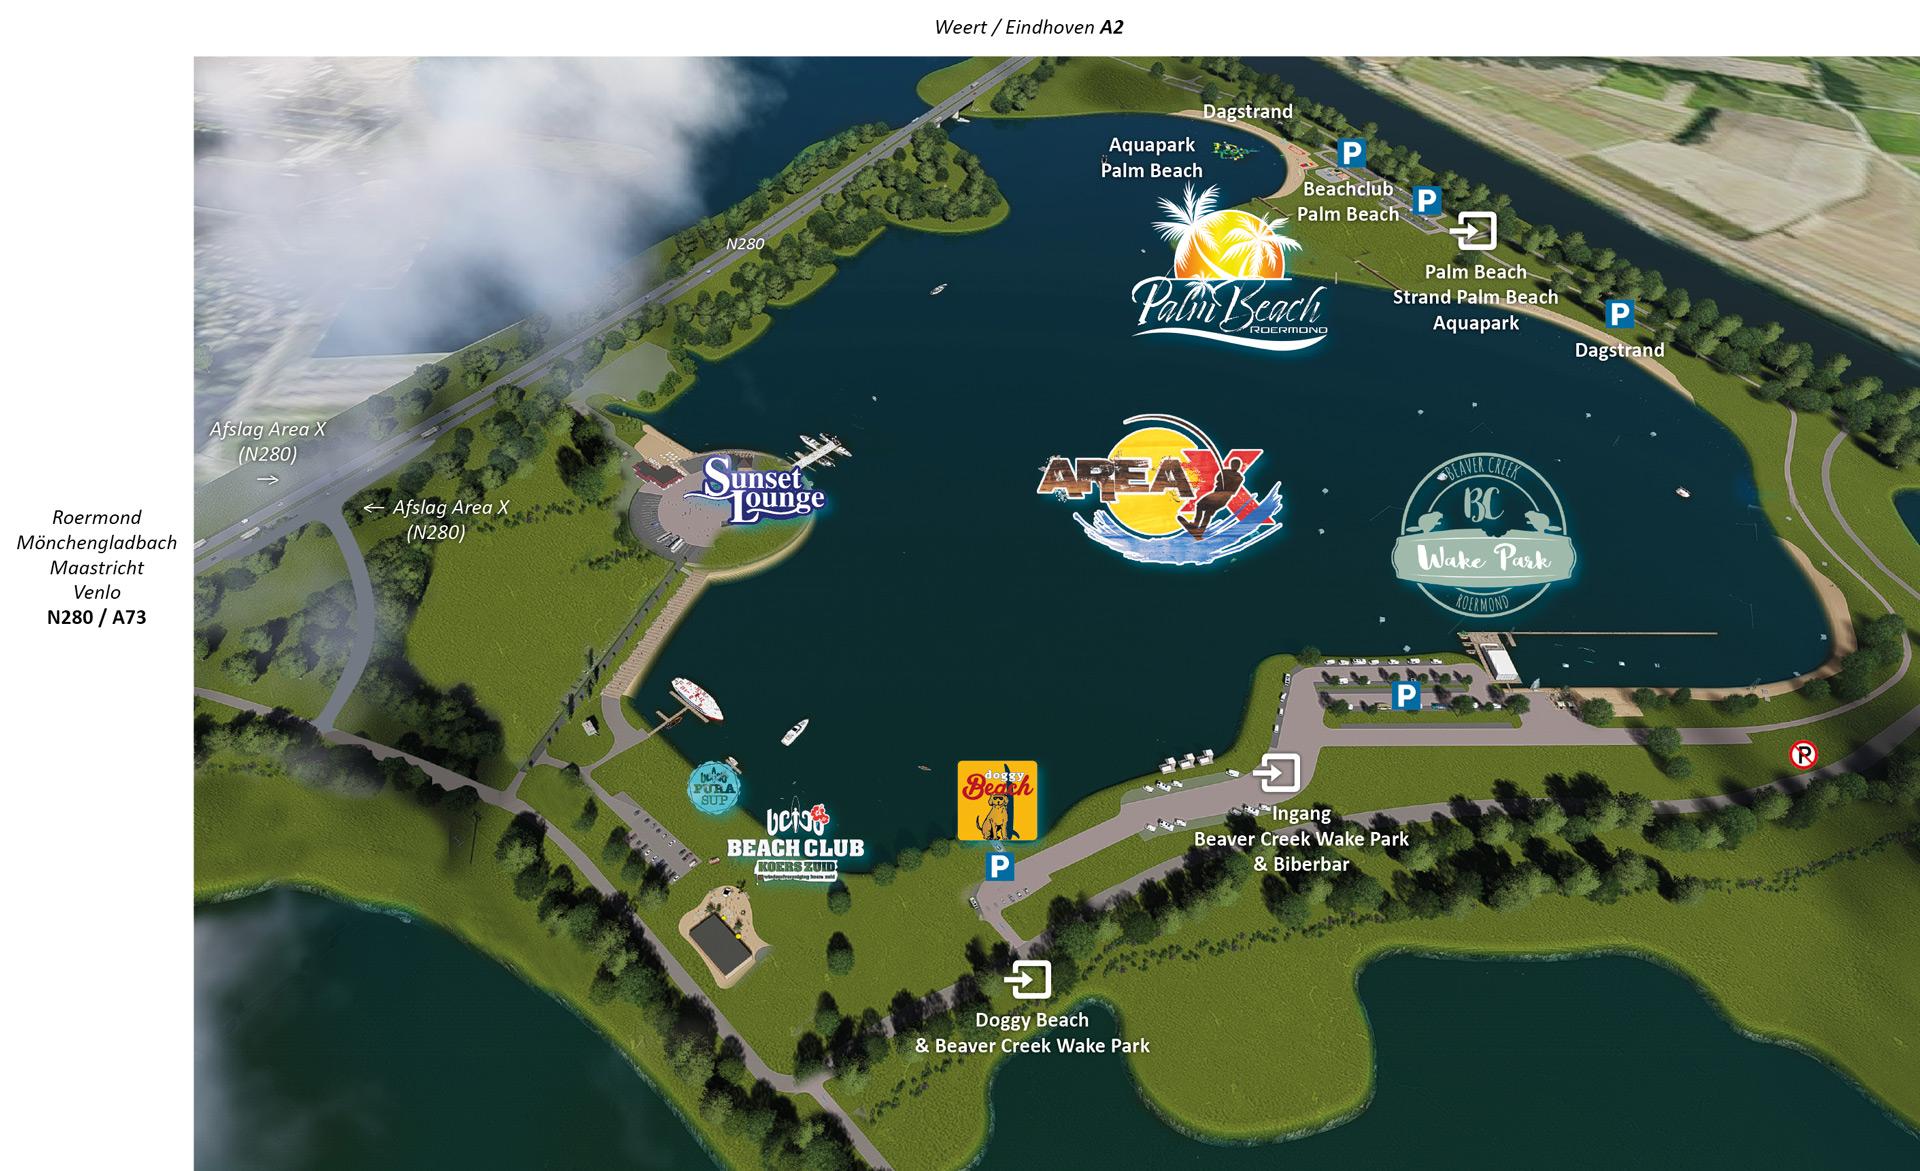 Area_X_Roermond-plattegrond-dagstrand_wakeboardanlage_wakeboardbaan